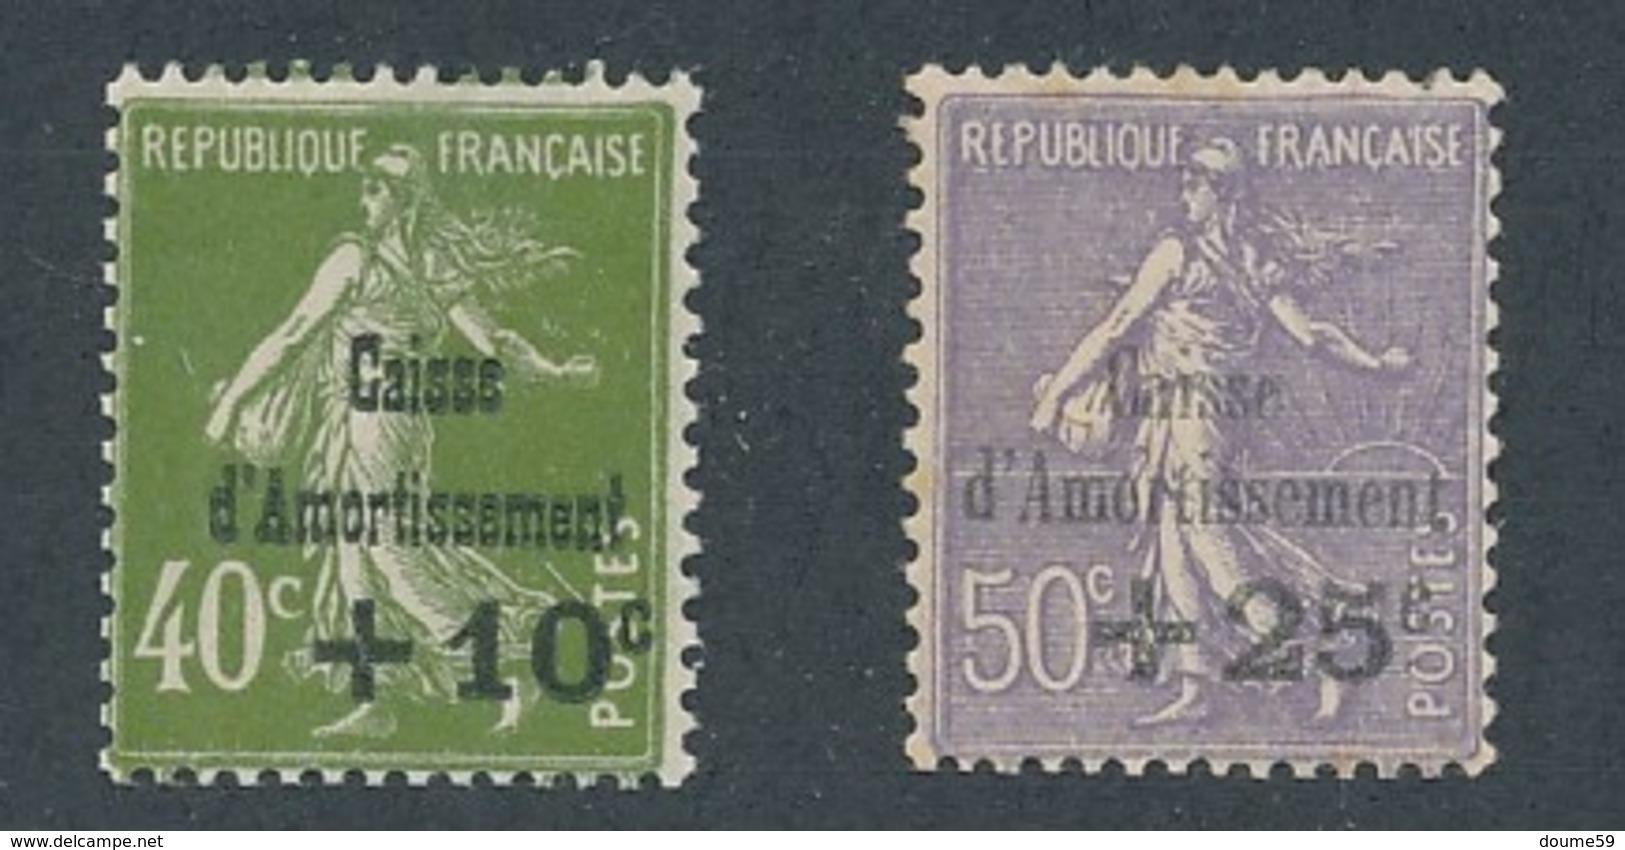 CX-214: FRANCE: Lot Avec N°275*-276* - France